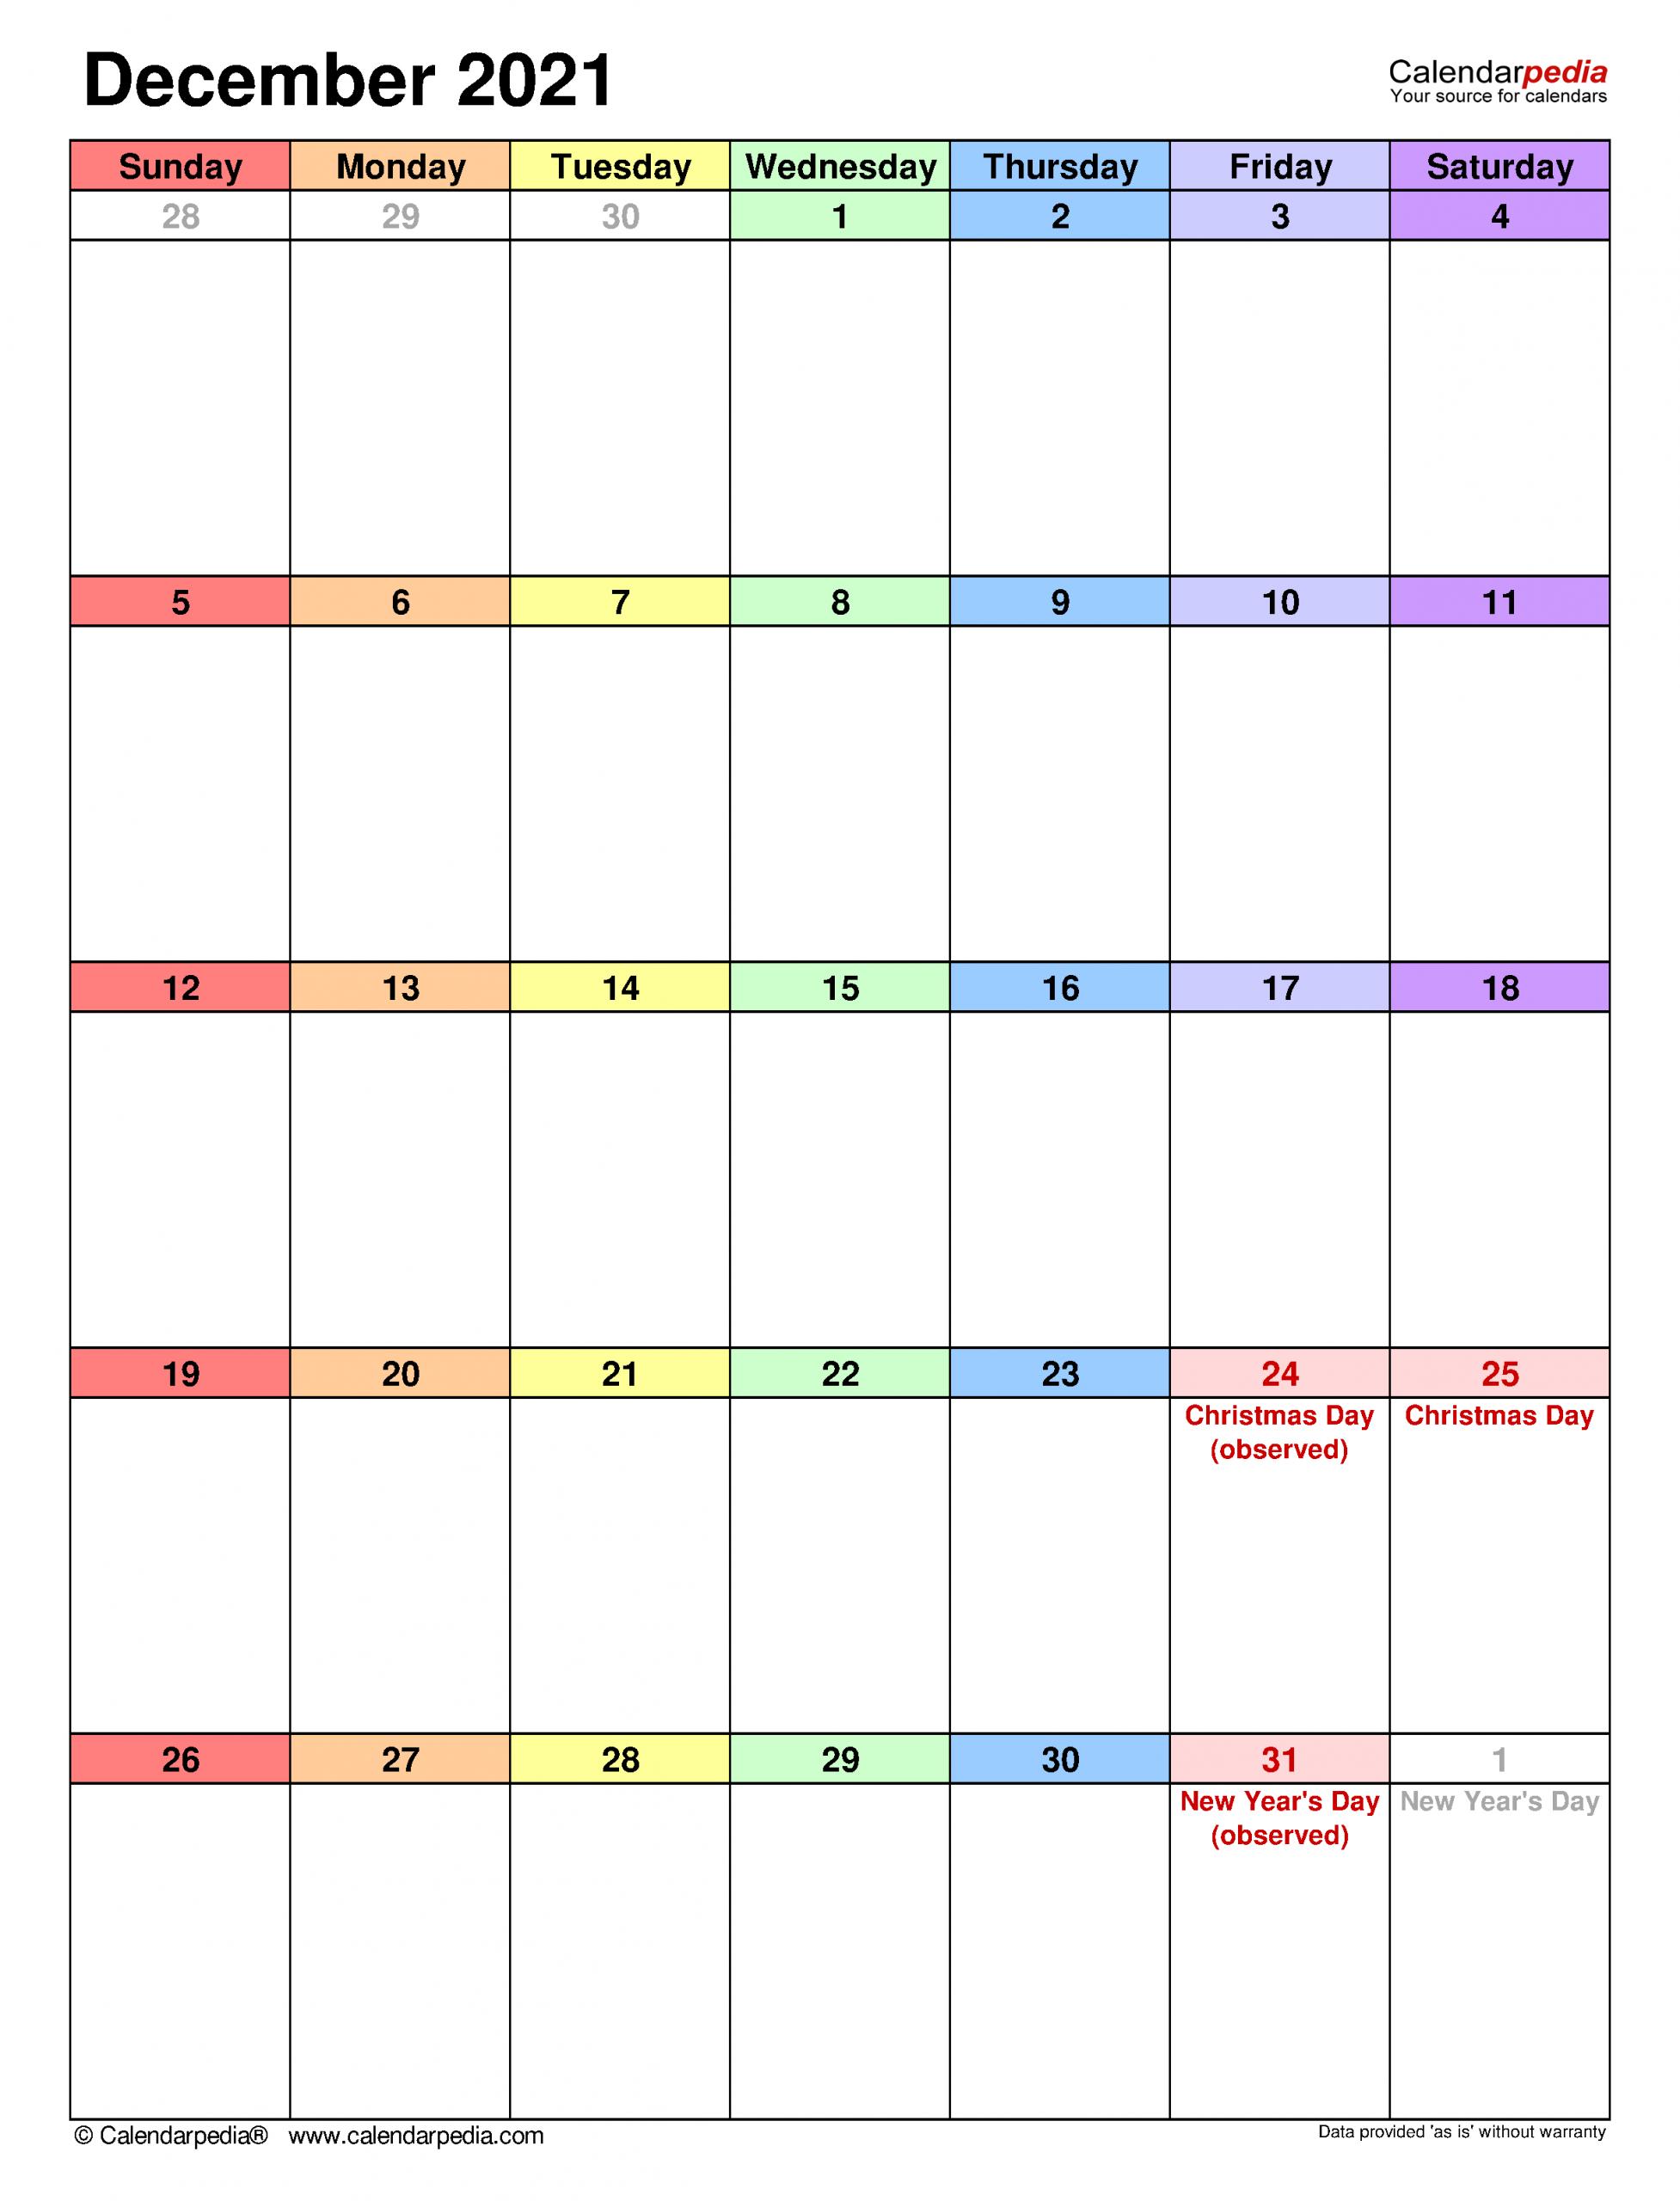 December 2021 Calendar | Templates For Word, Excel And Pdf December 2021 Calendar Printable Free